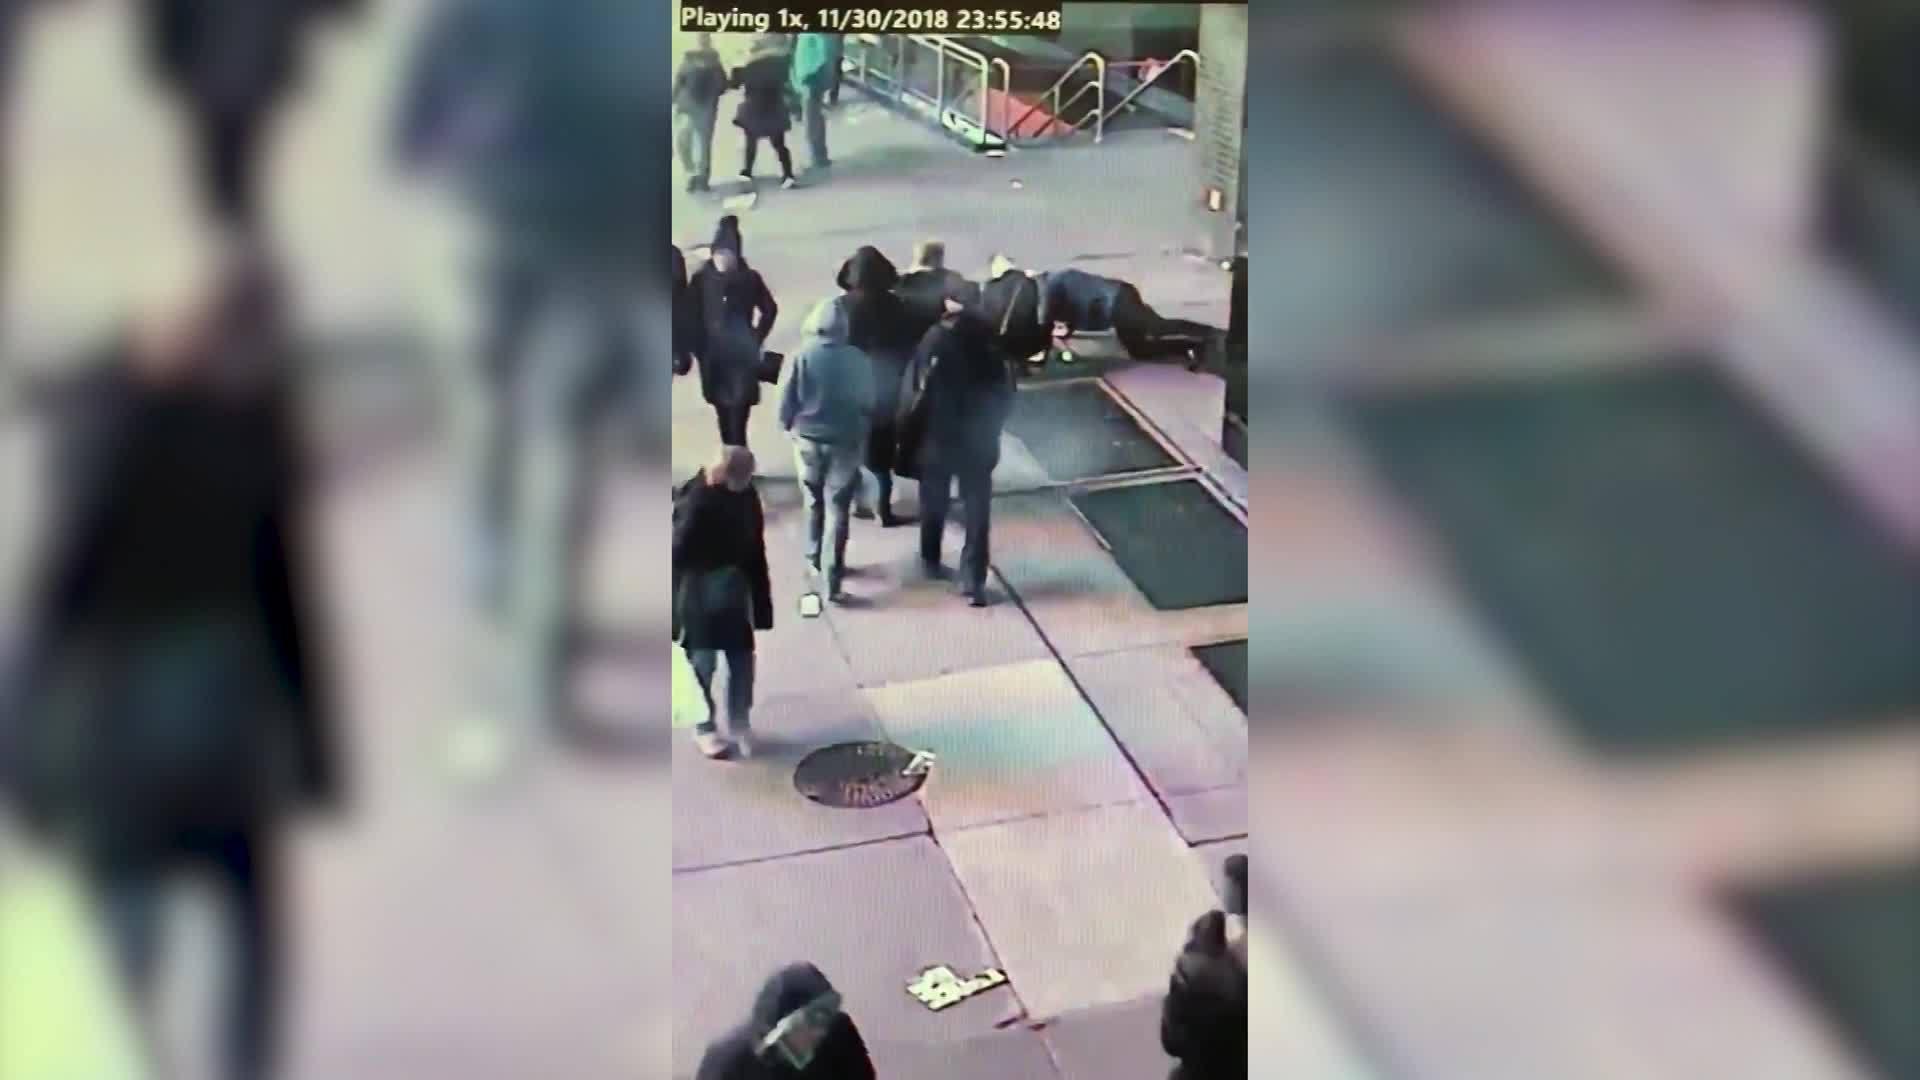 RAW: Man drops engagement ring down NYC drain